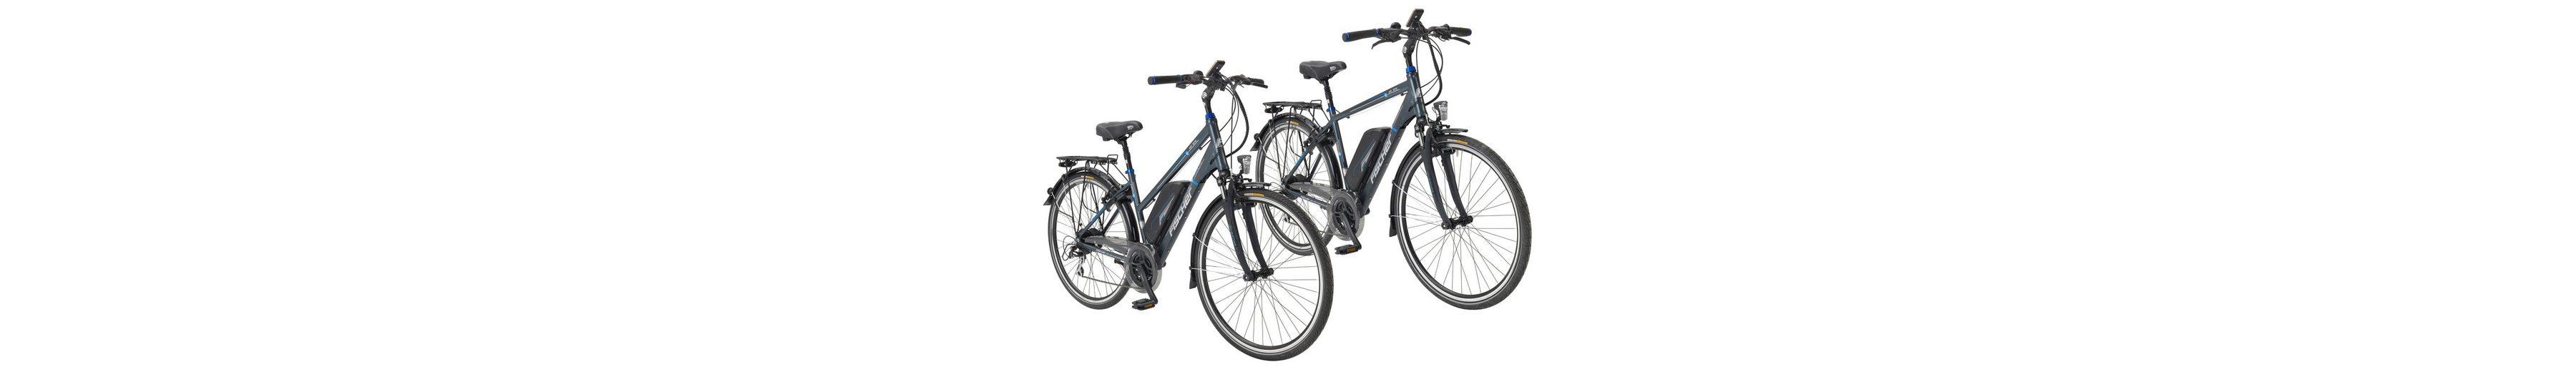 Sparset: »2 Trekking-E-Bikes im Doppelpack« (1 x Herren, 1 x Damen, 28 Zoll)